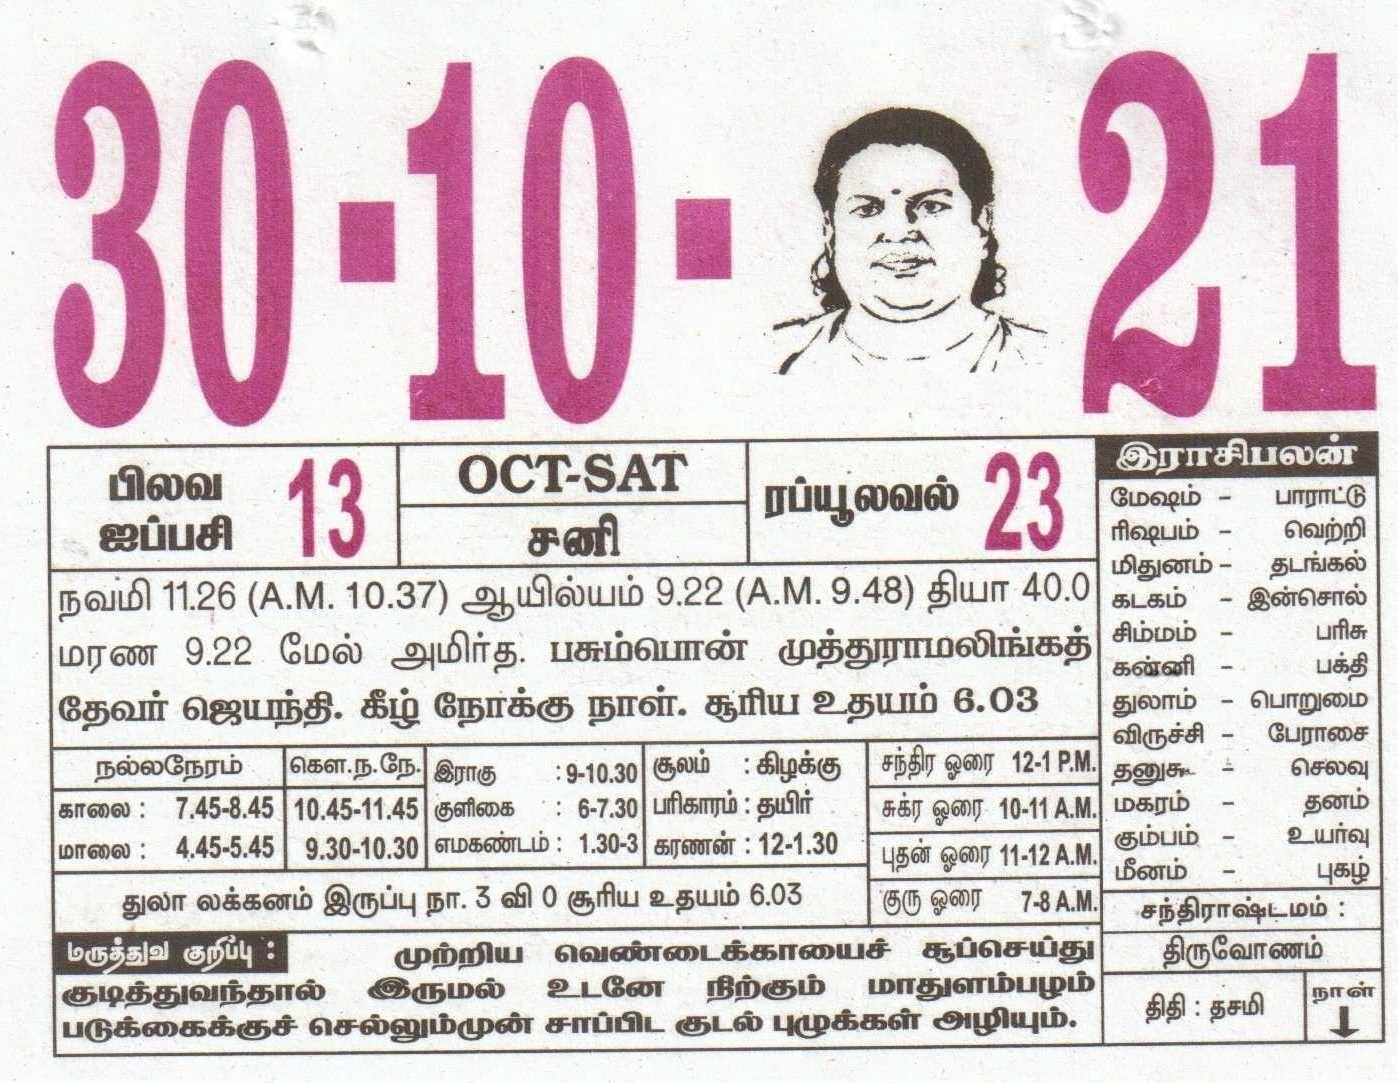 30-10-2021 Daily Calendar | Date 30 , January Daily Tear Off Calendar | Daily Panchangam Rasi Palan August 2021 Tamil Daily Calendar